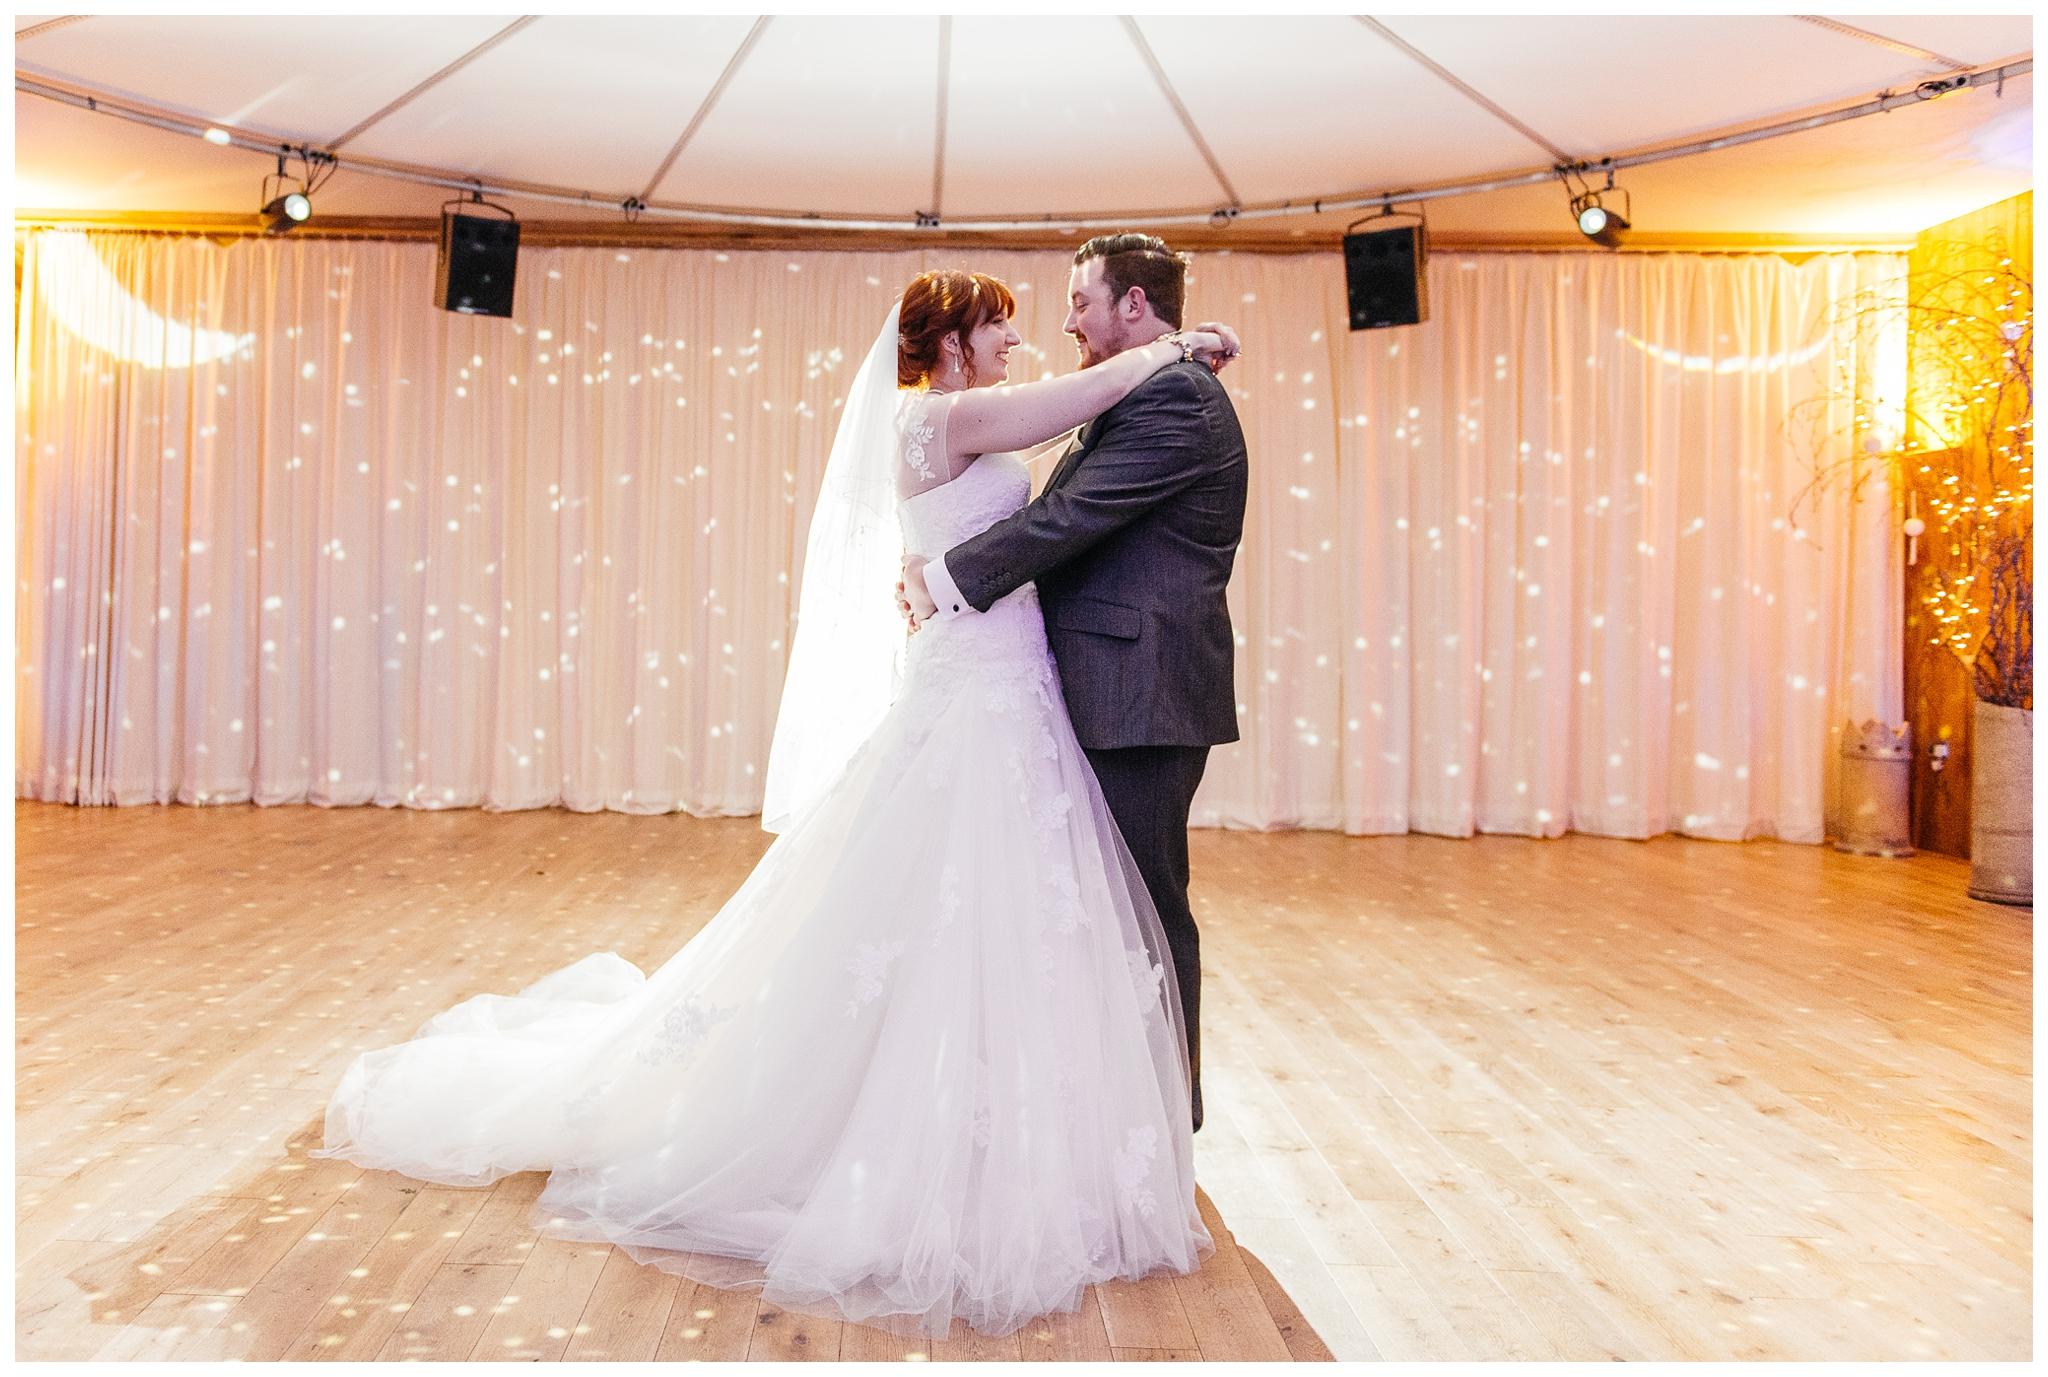 Emma&Paul-Elmore-Court-Winter-Wedding-Nikki-Cooper-Photography_0097.jpg